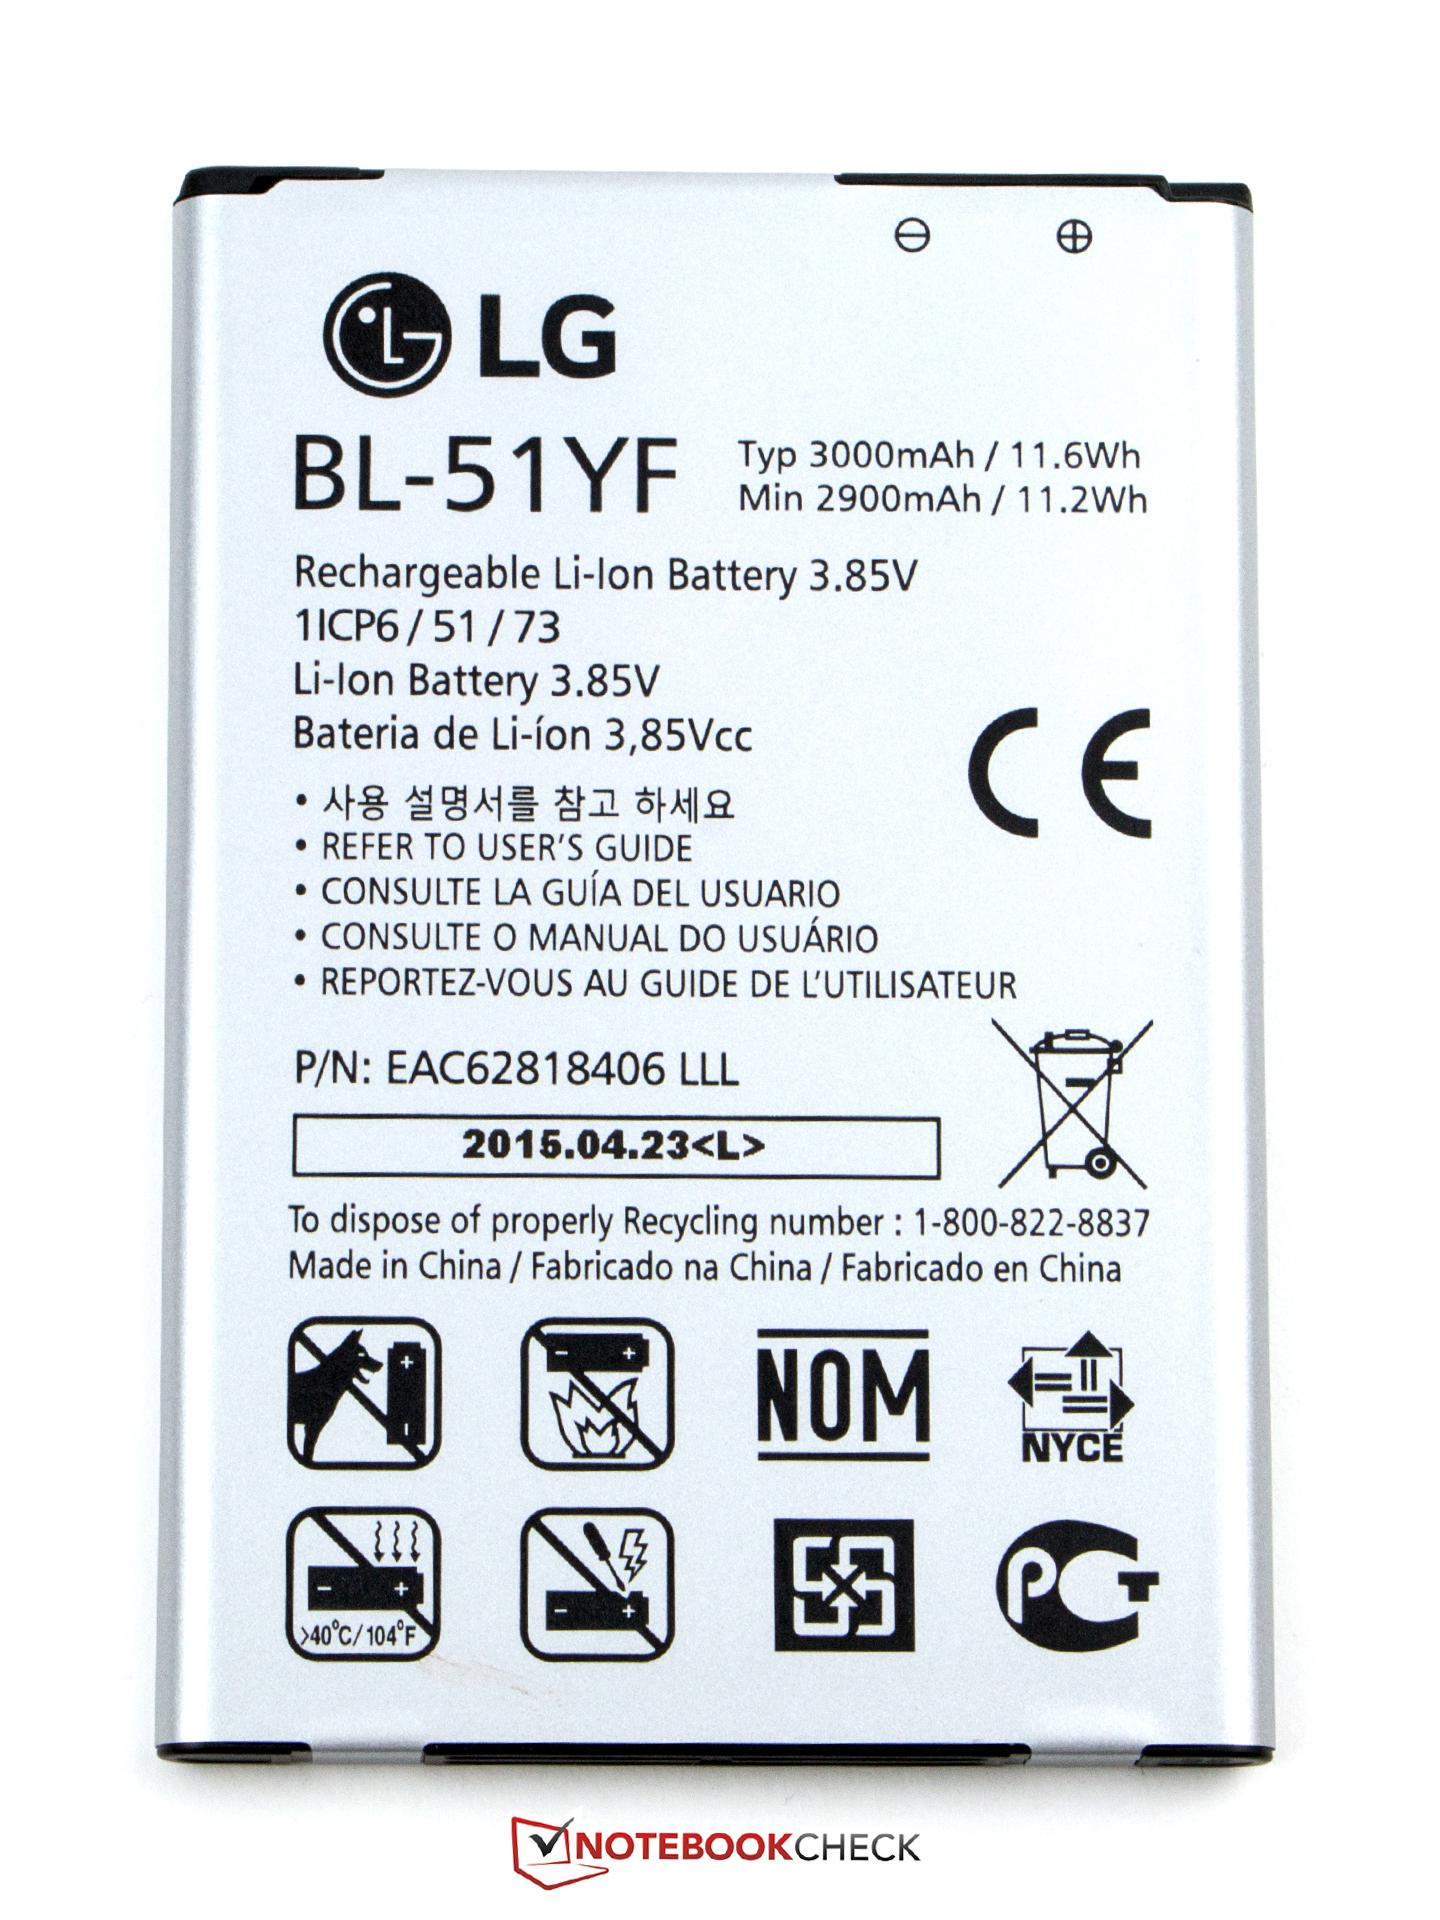 Lg g4 smartphone lg deutschland - The Battery Has 3000 Mah Full Resolution